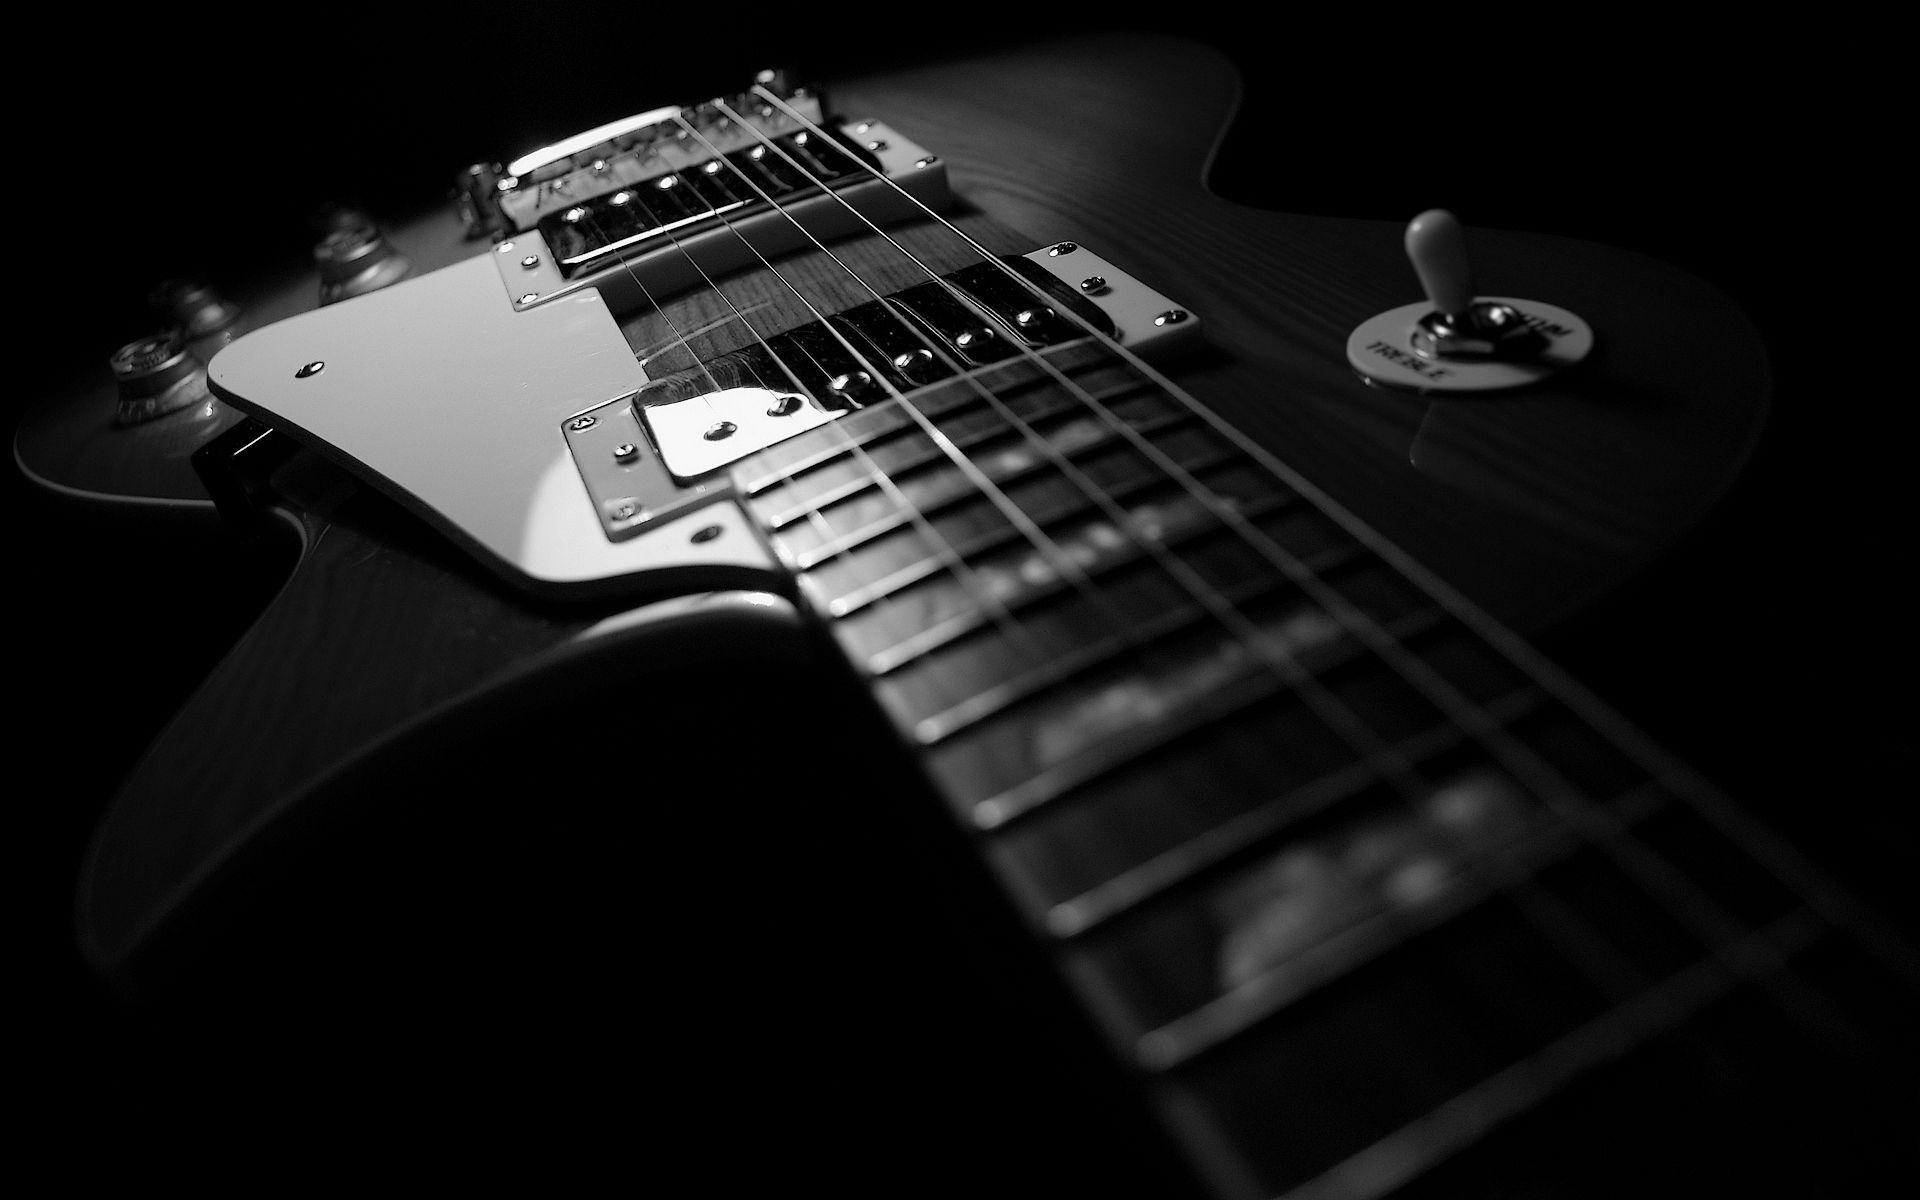 Guitar On Fire Wallpaper | Wallpaper Download